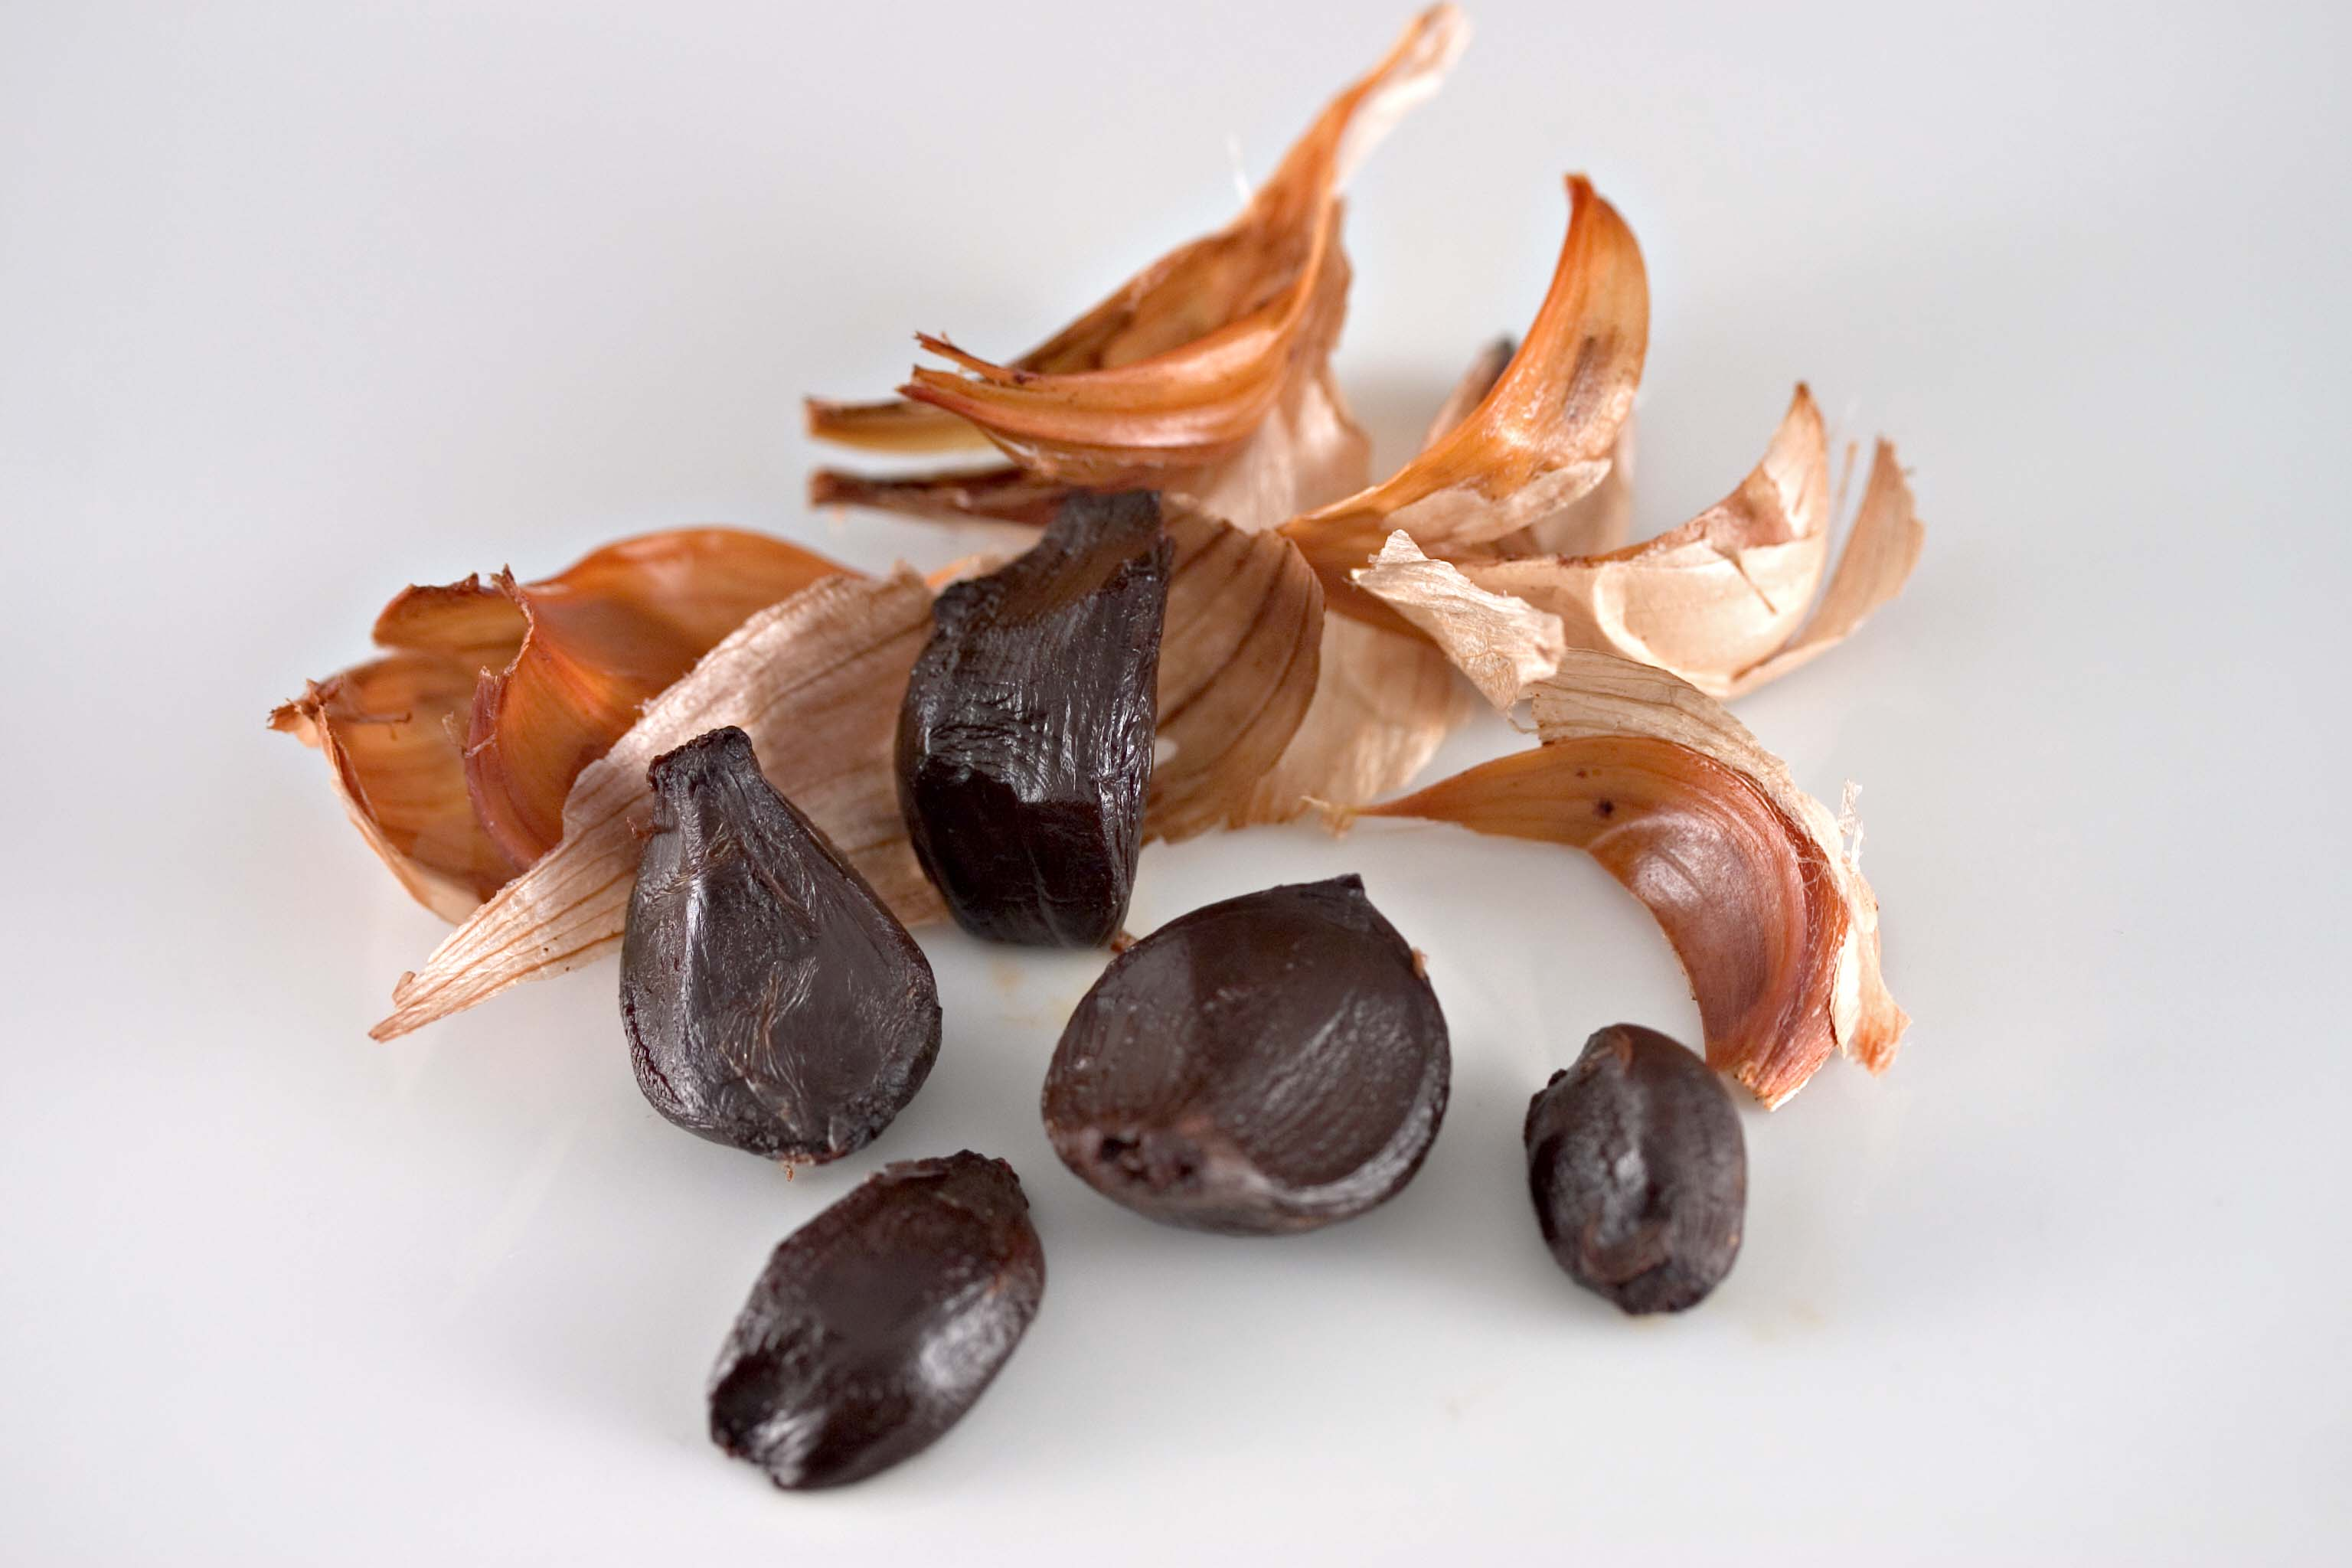 Archivo:Peeled Black Garlic.jpg - Wikipedia, la enciclopedia libre